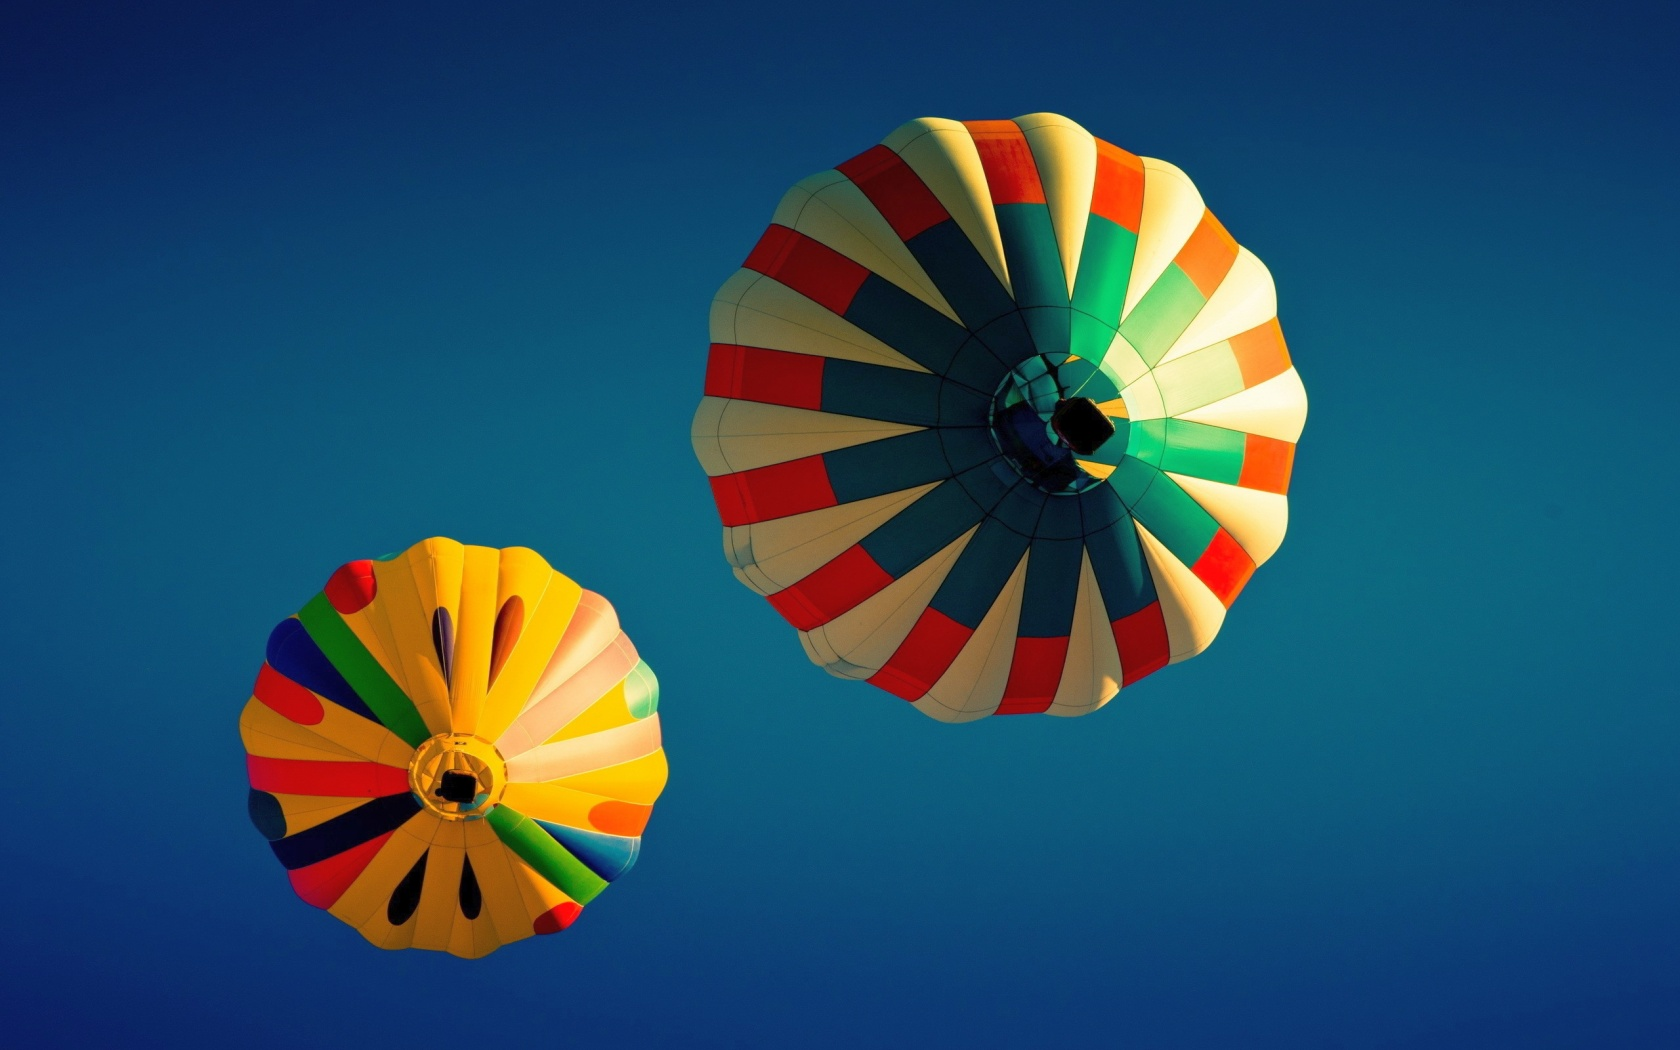 Wonderful Wallpapers Hd 21 Wonderful Hd Hot Air Balloon Wallpapers